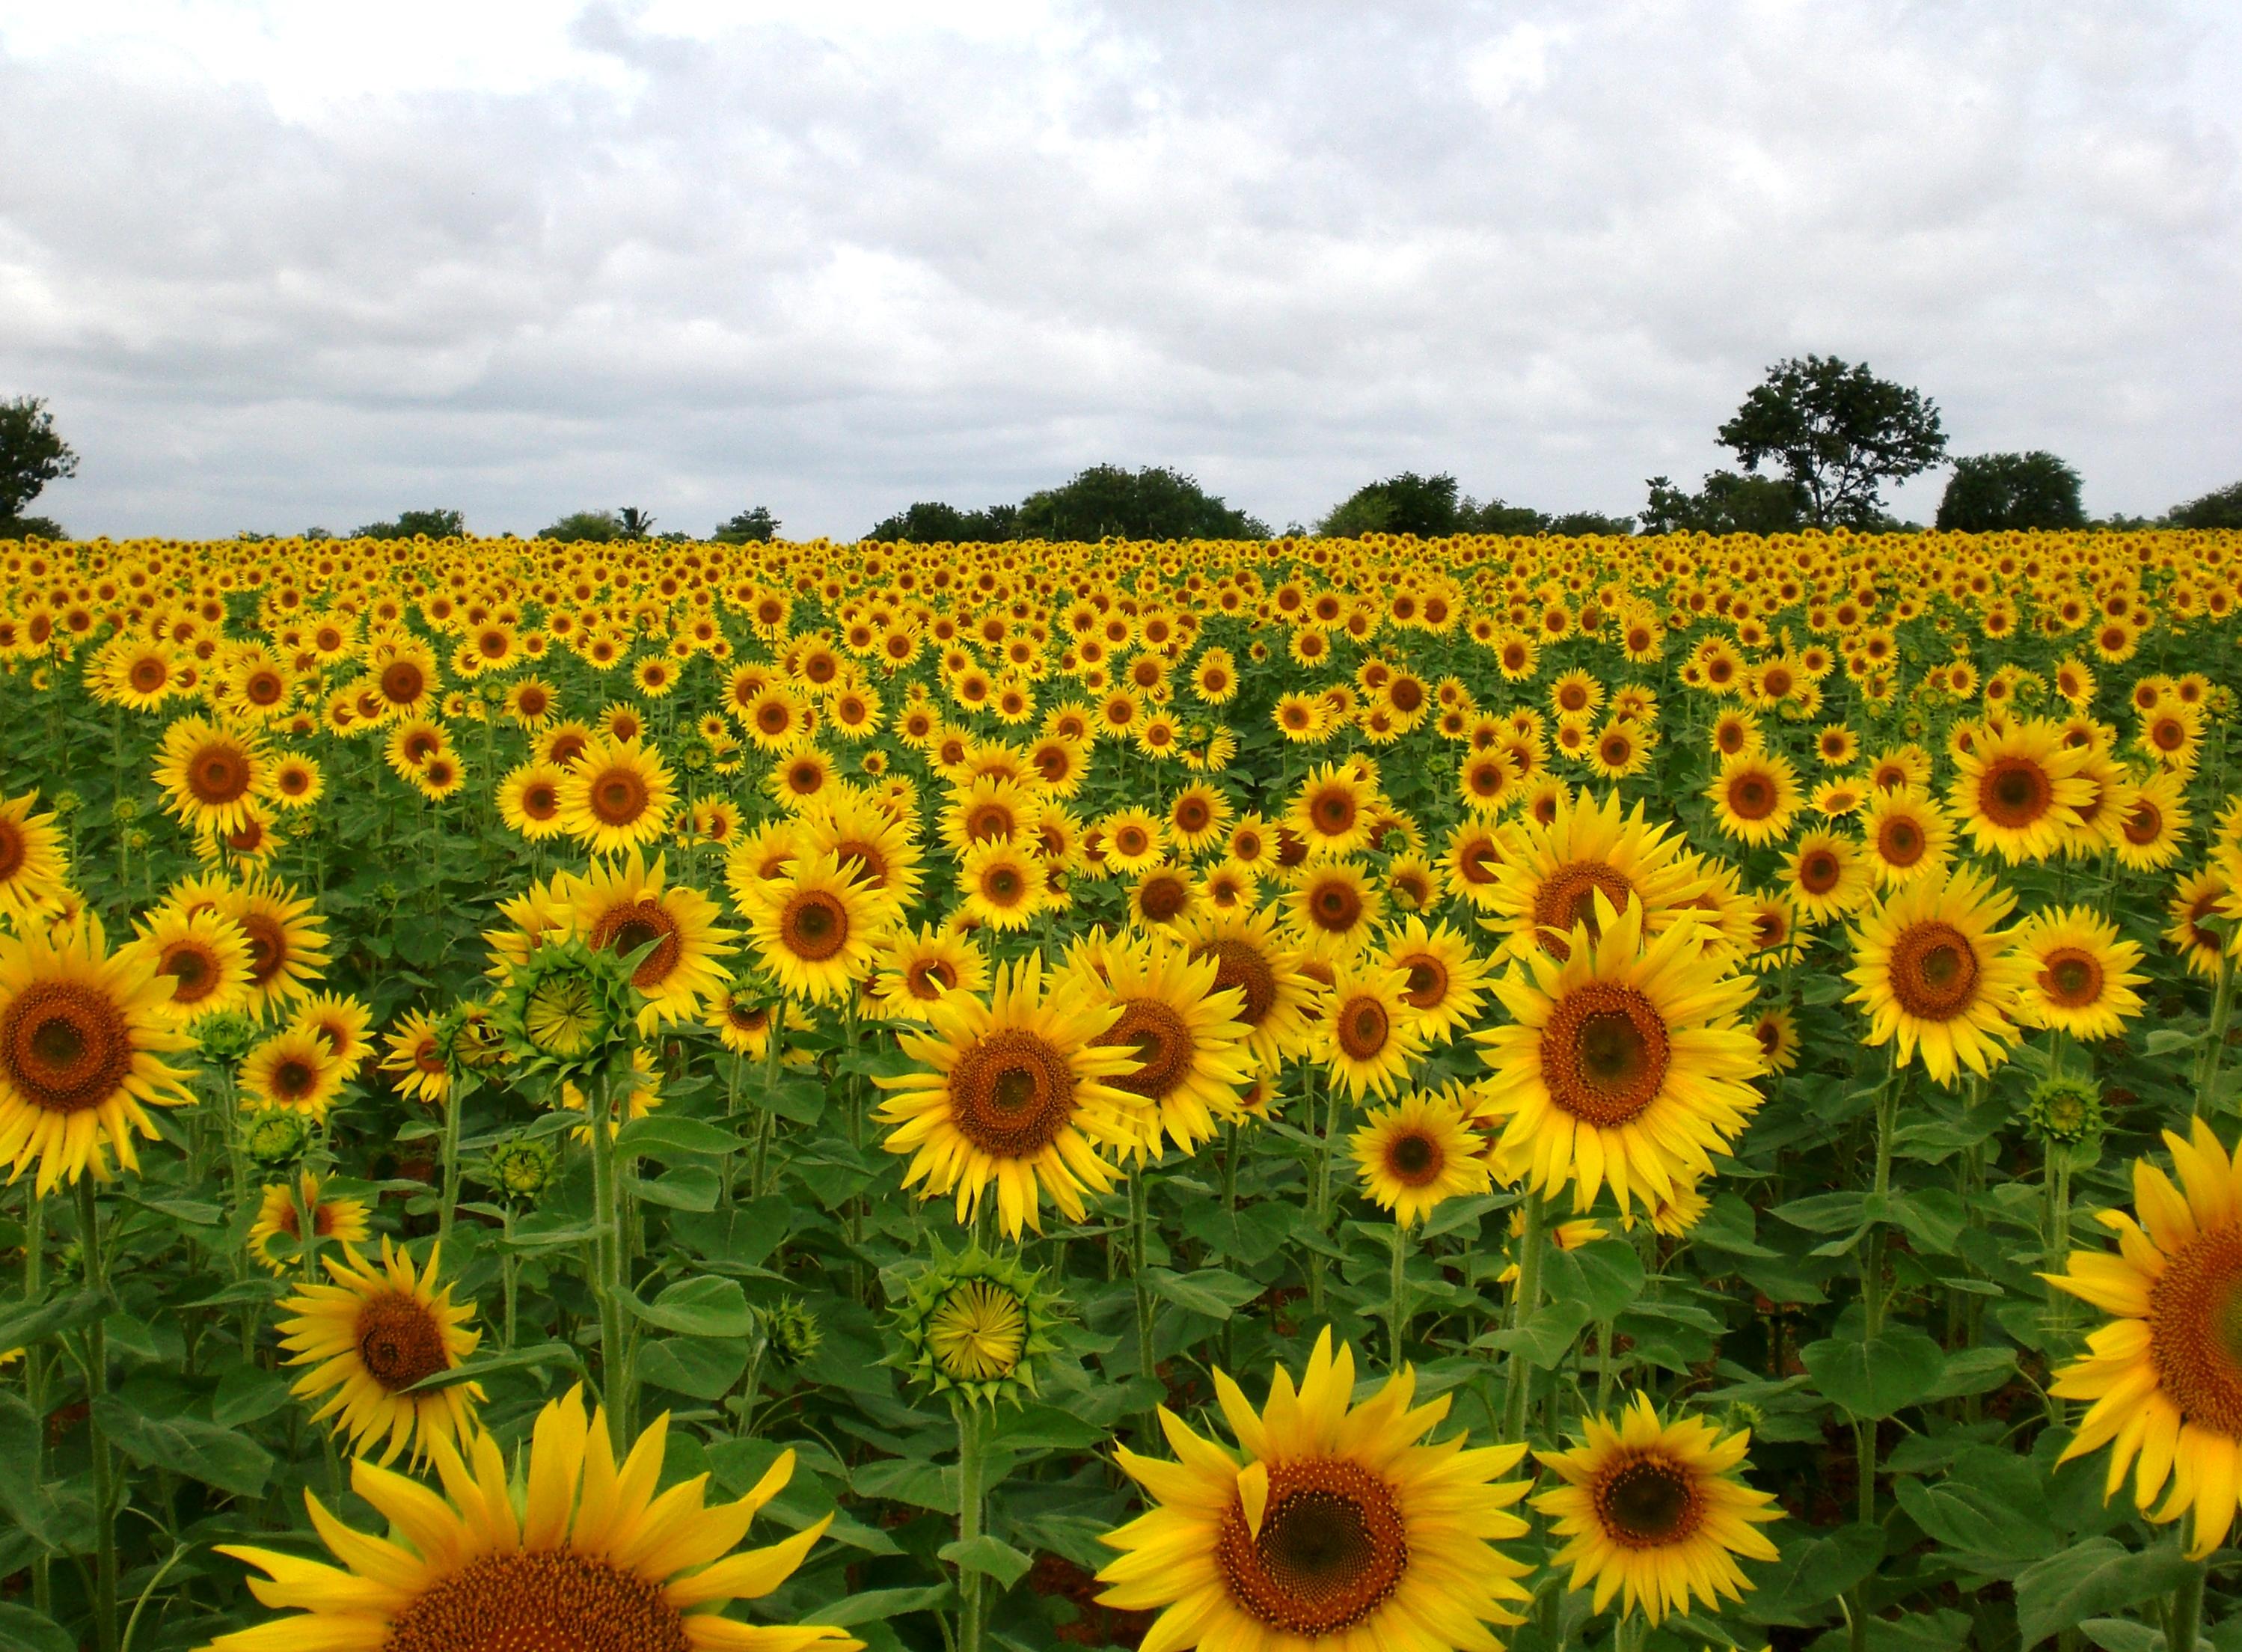 sunflower fields 2 by - photo #36